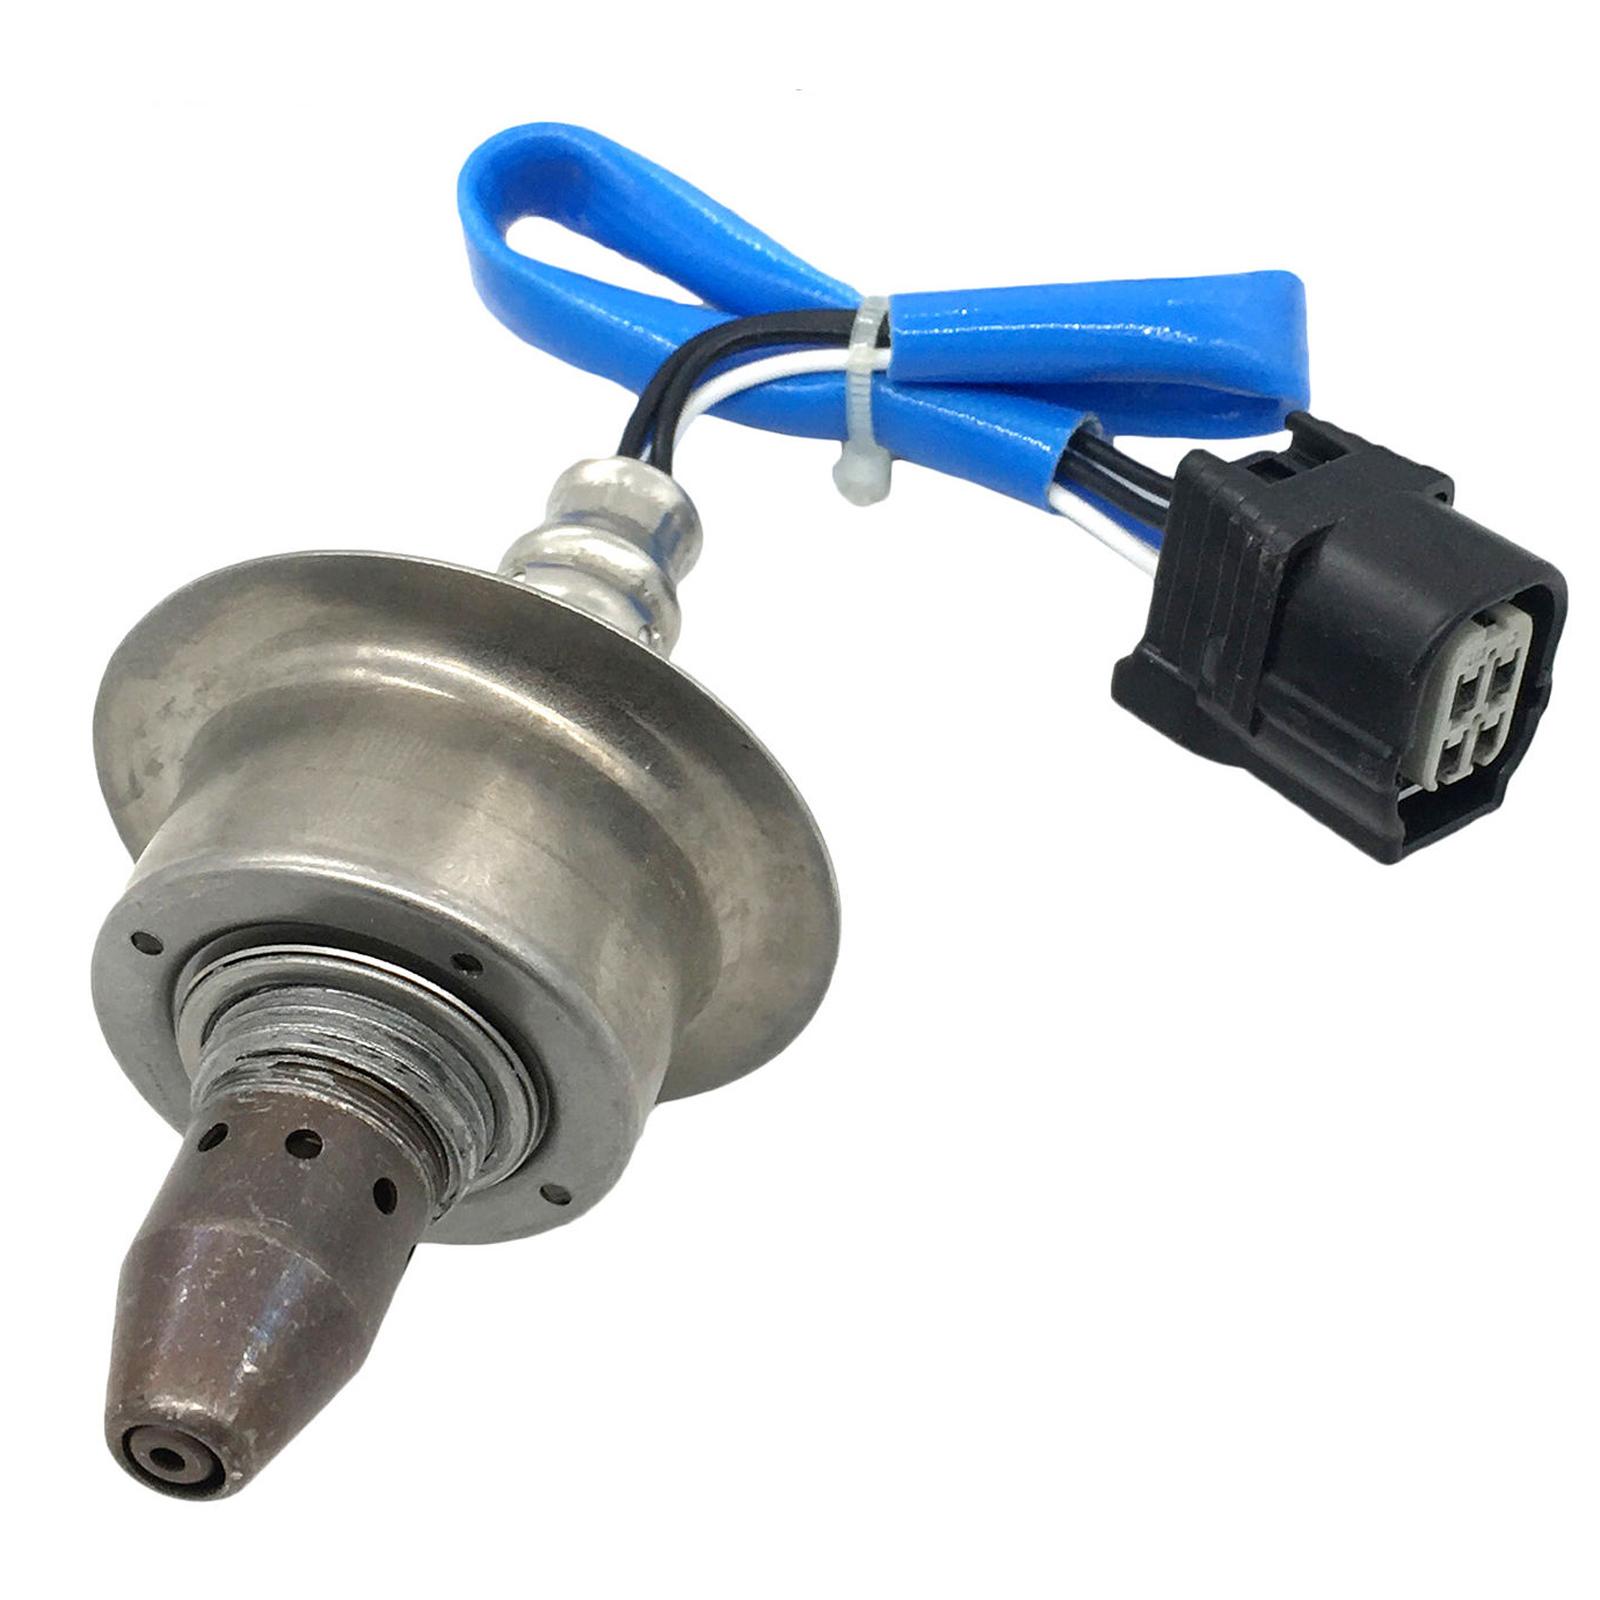 Oxygen Sensor Air Fuel Ratio Sensor For Honda Civic Accord Acura ILX 234-9119